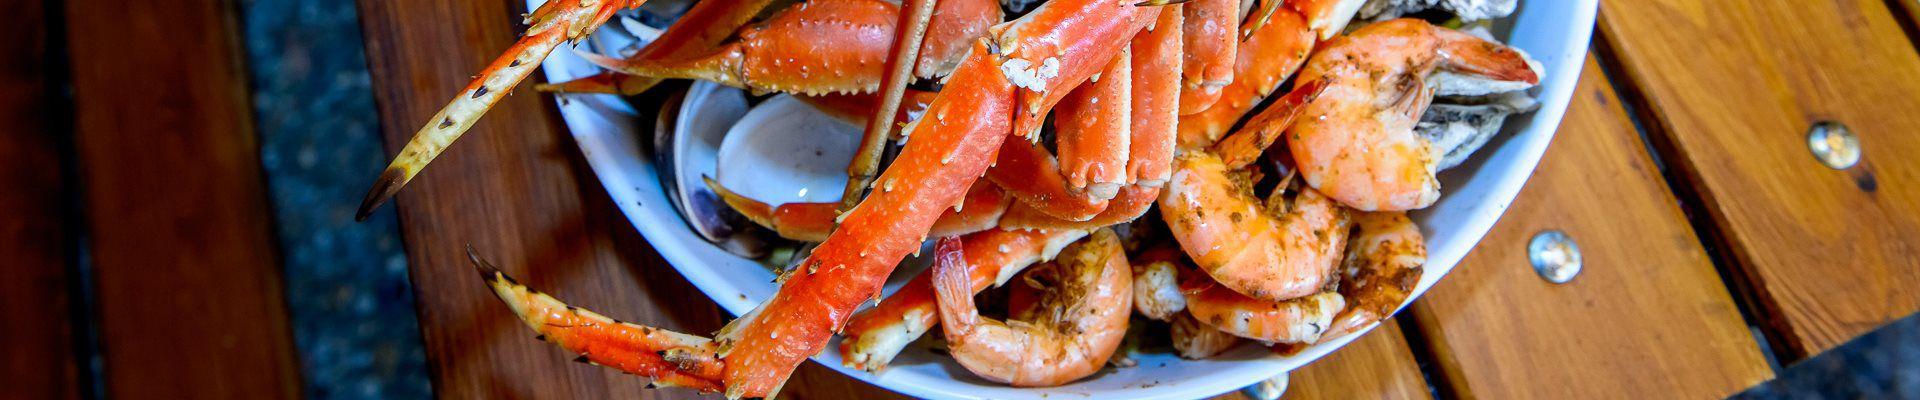 Santa barbara banquet enterprise fish co for Enterprise fish co santa barbara